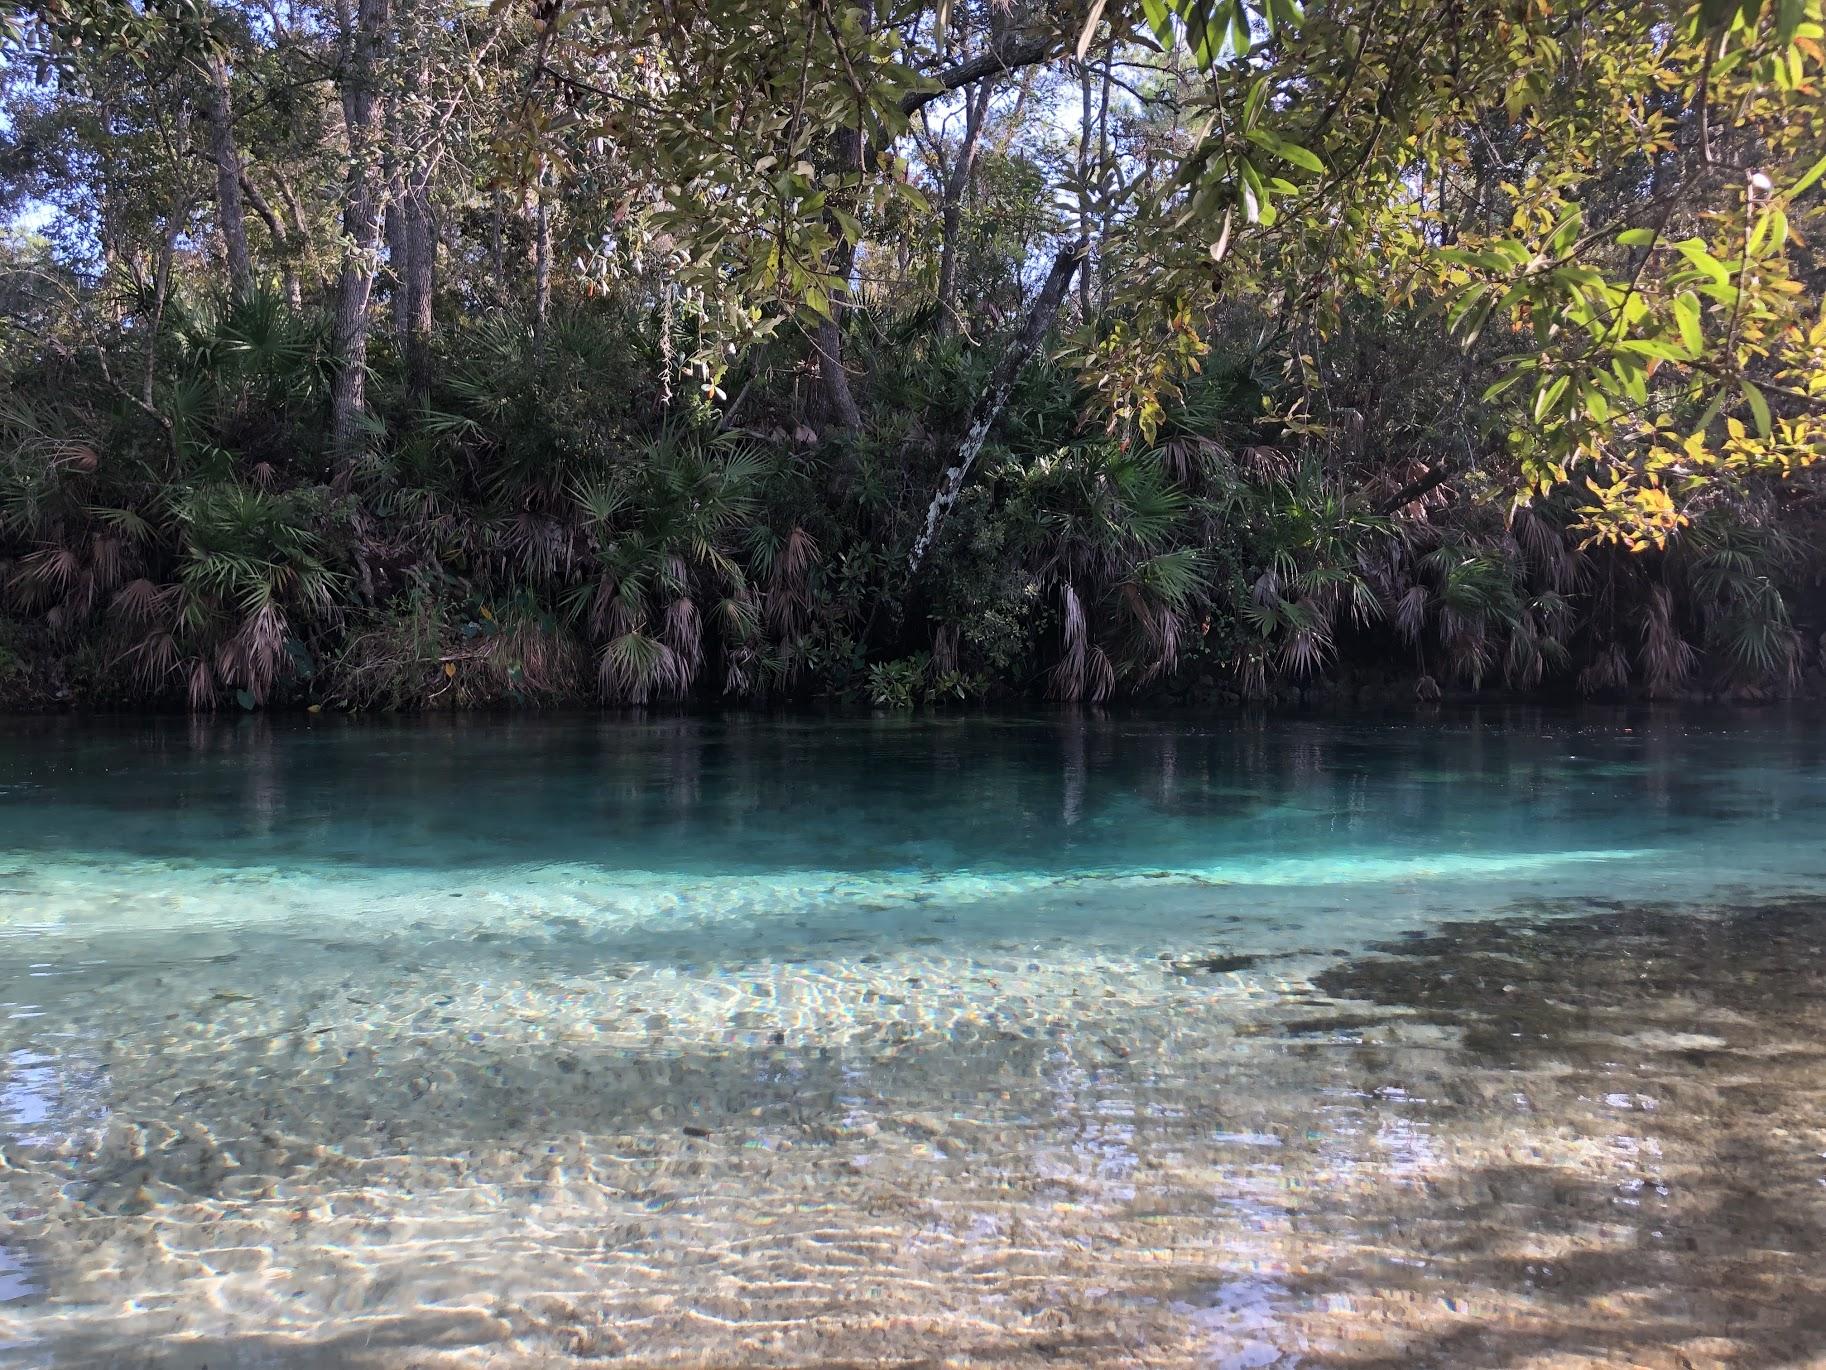 Snorklers Paradise at Weeki Wachee